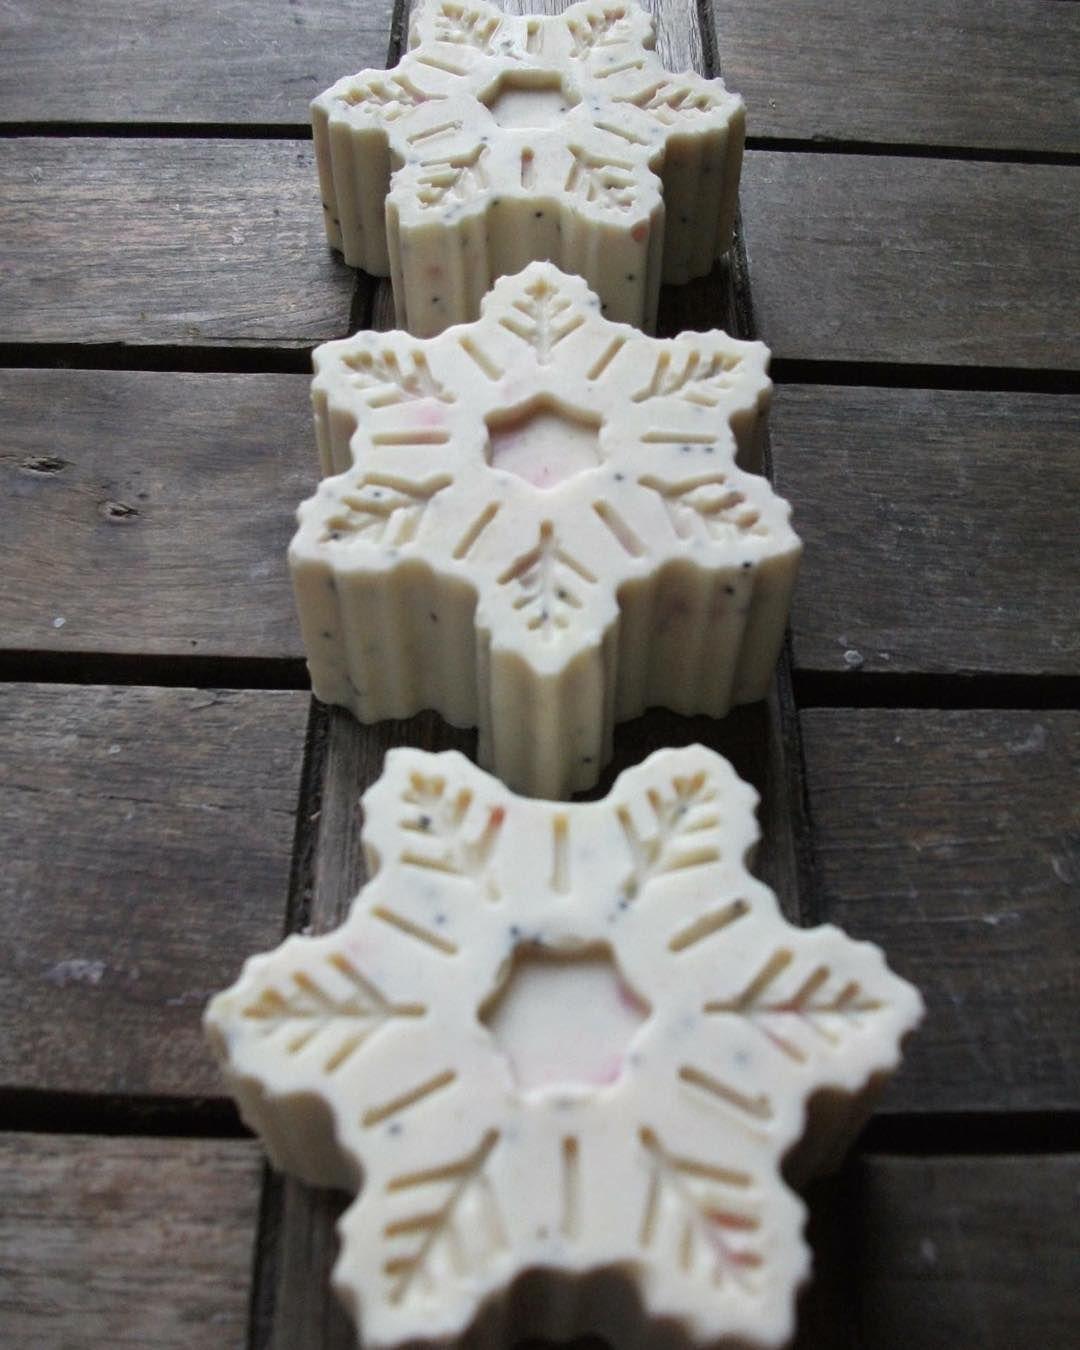 Hópehyel szappan sheavajjal snowflake soap shea butter